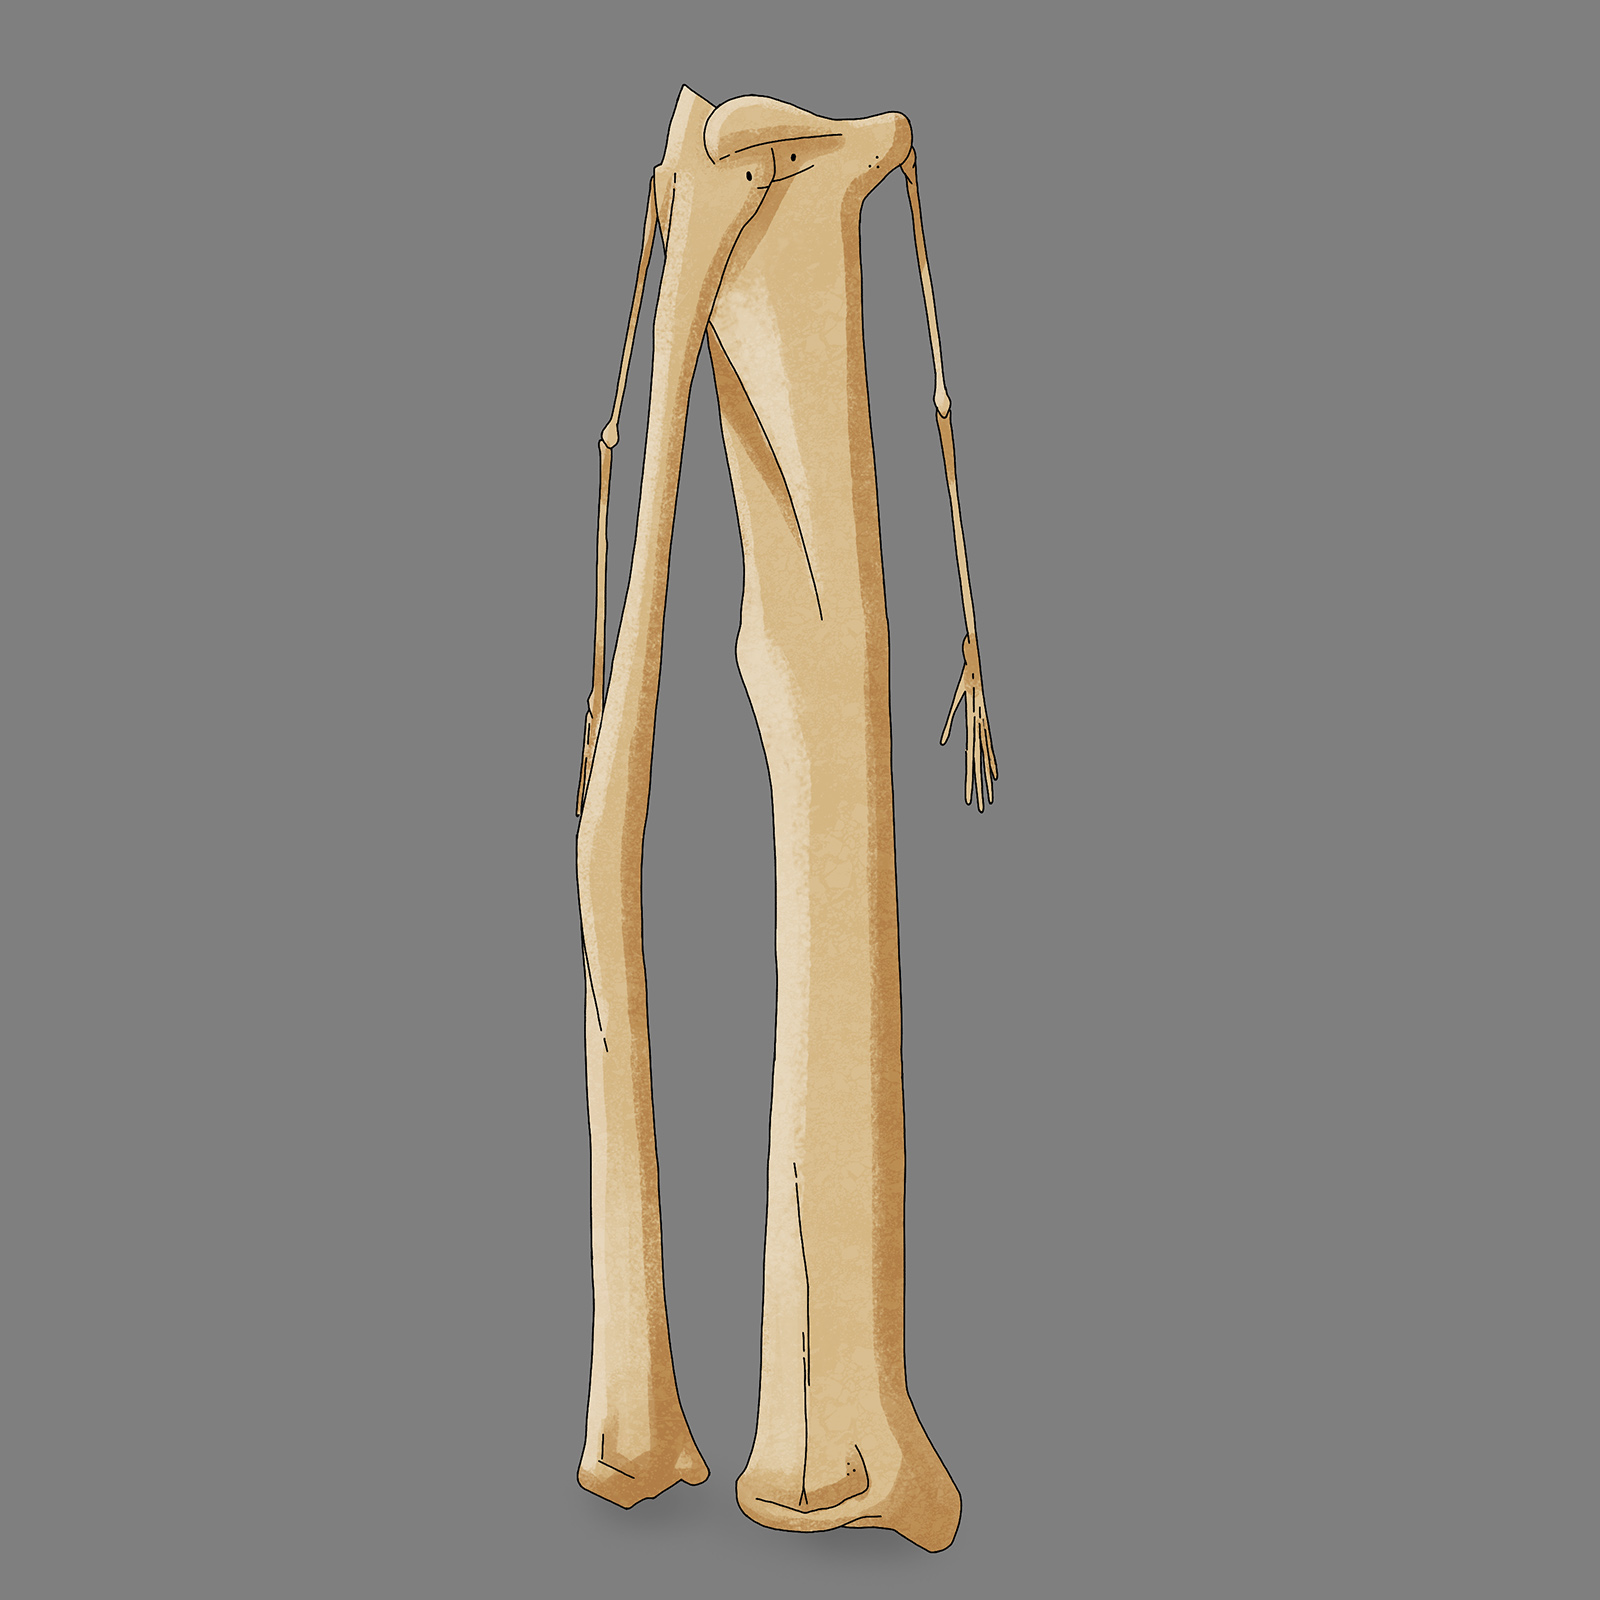 Character Design for Bone